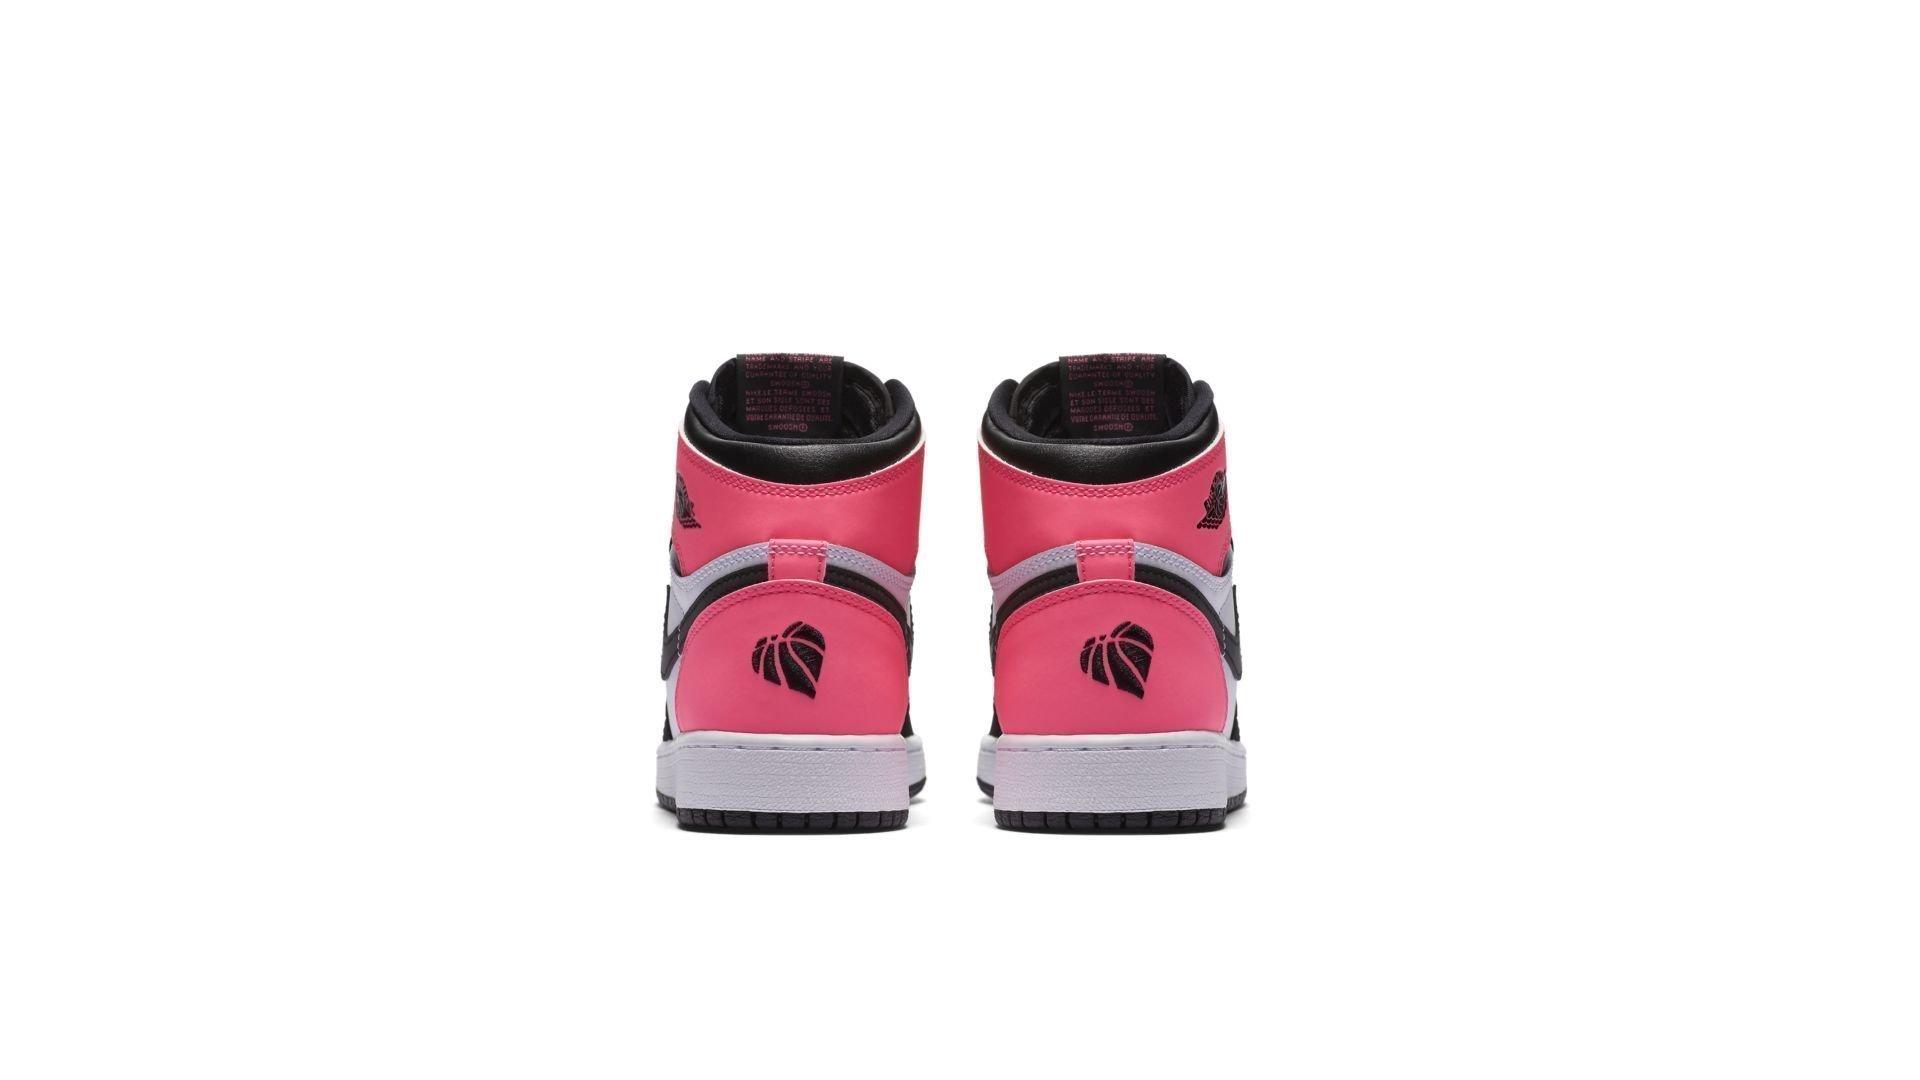 Jordan 1 Retro Valentine's Day 2017 (GS) (881426-009)